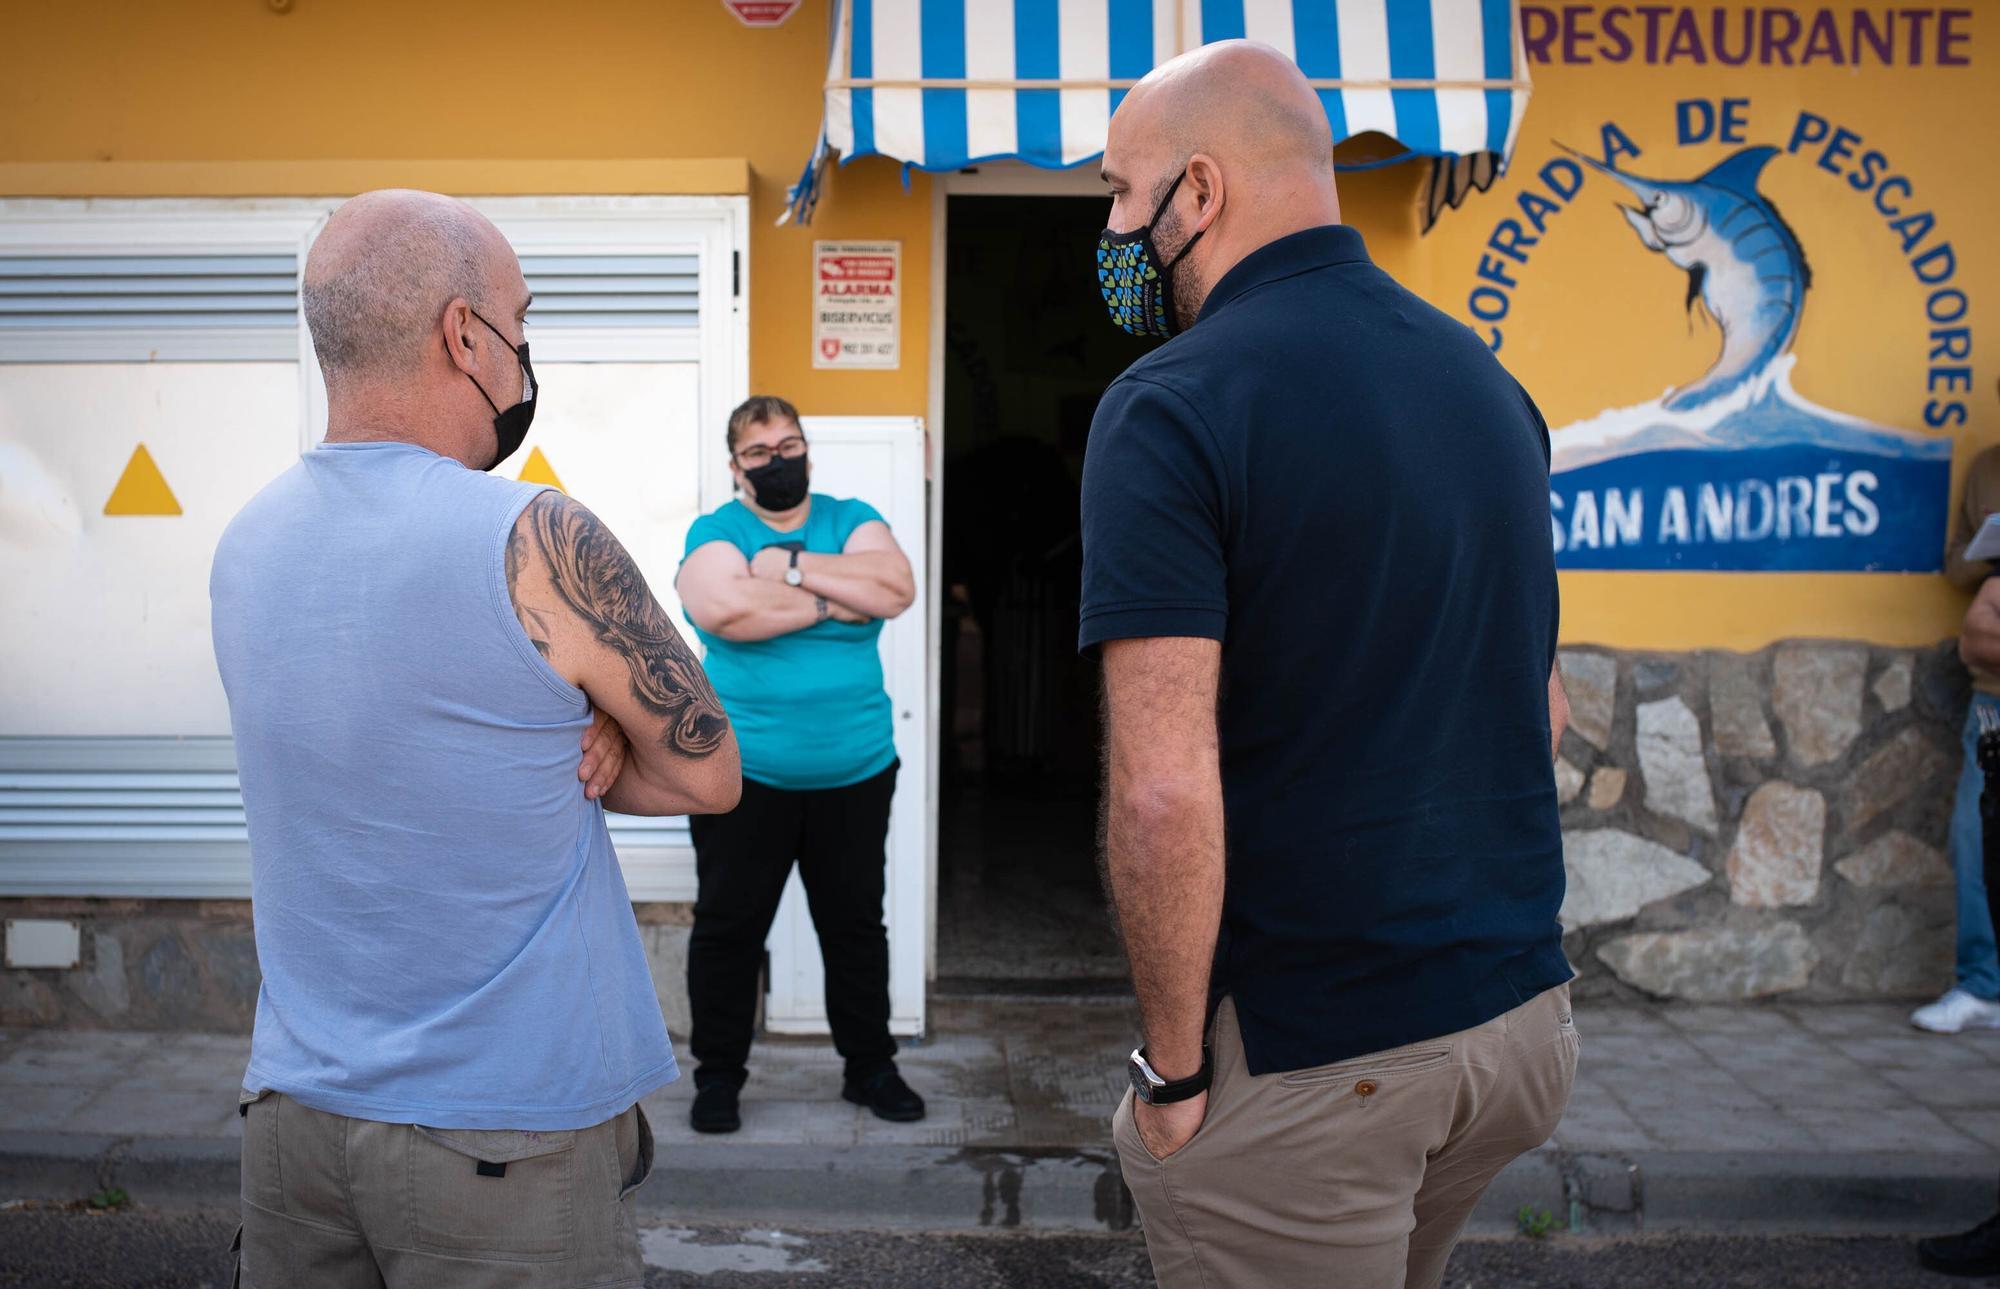 Precinto Restaurante Cofradía Pescadores San Andrés